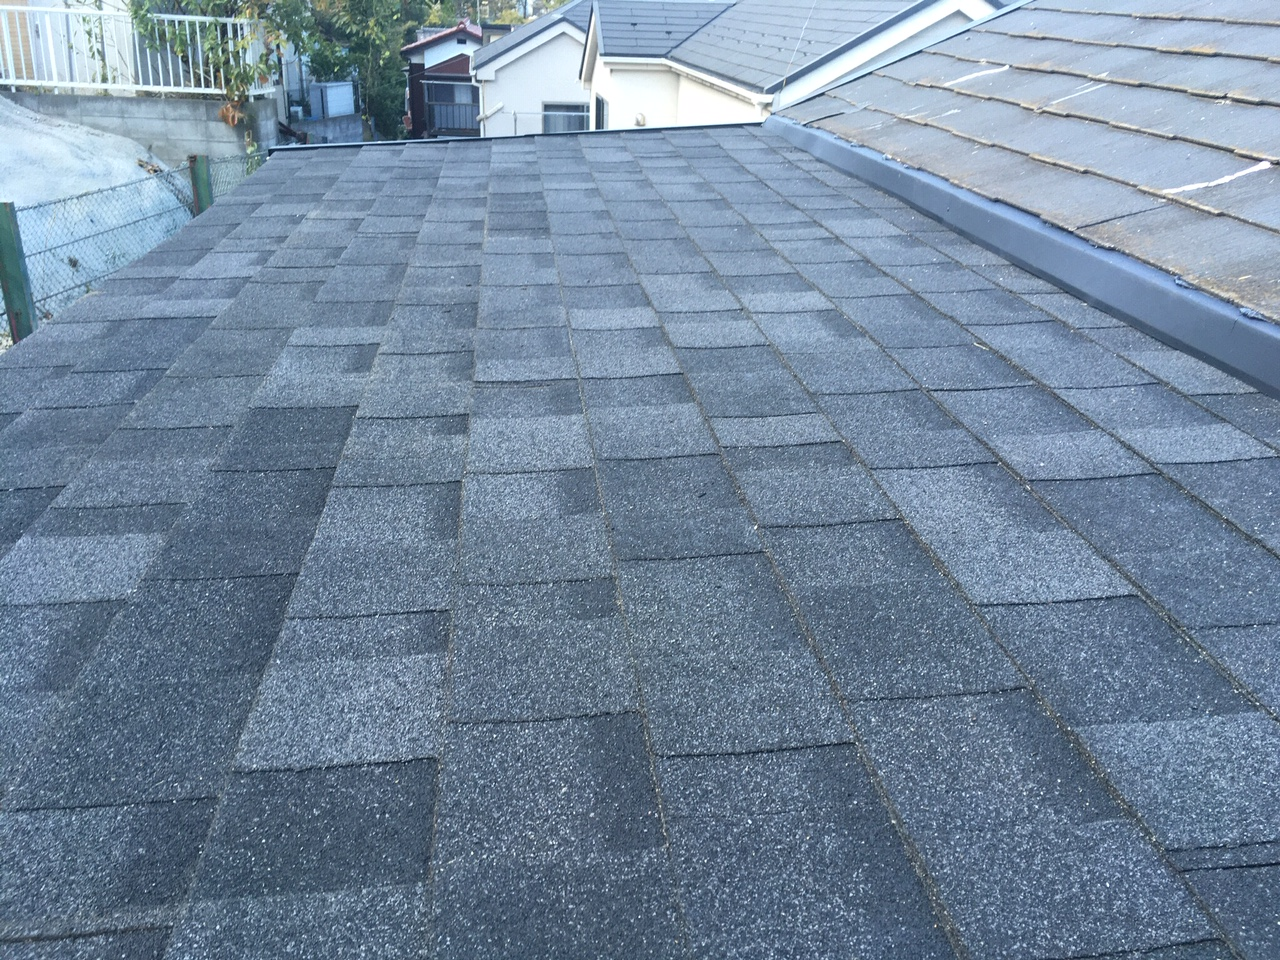 川崎市宮前区|屋根張替え工事の施工事例